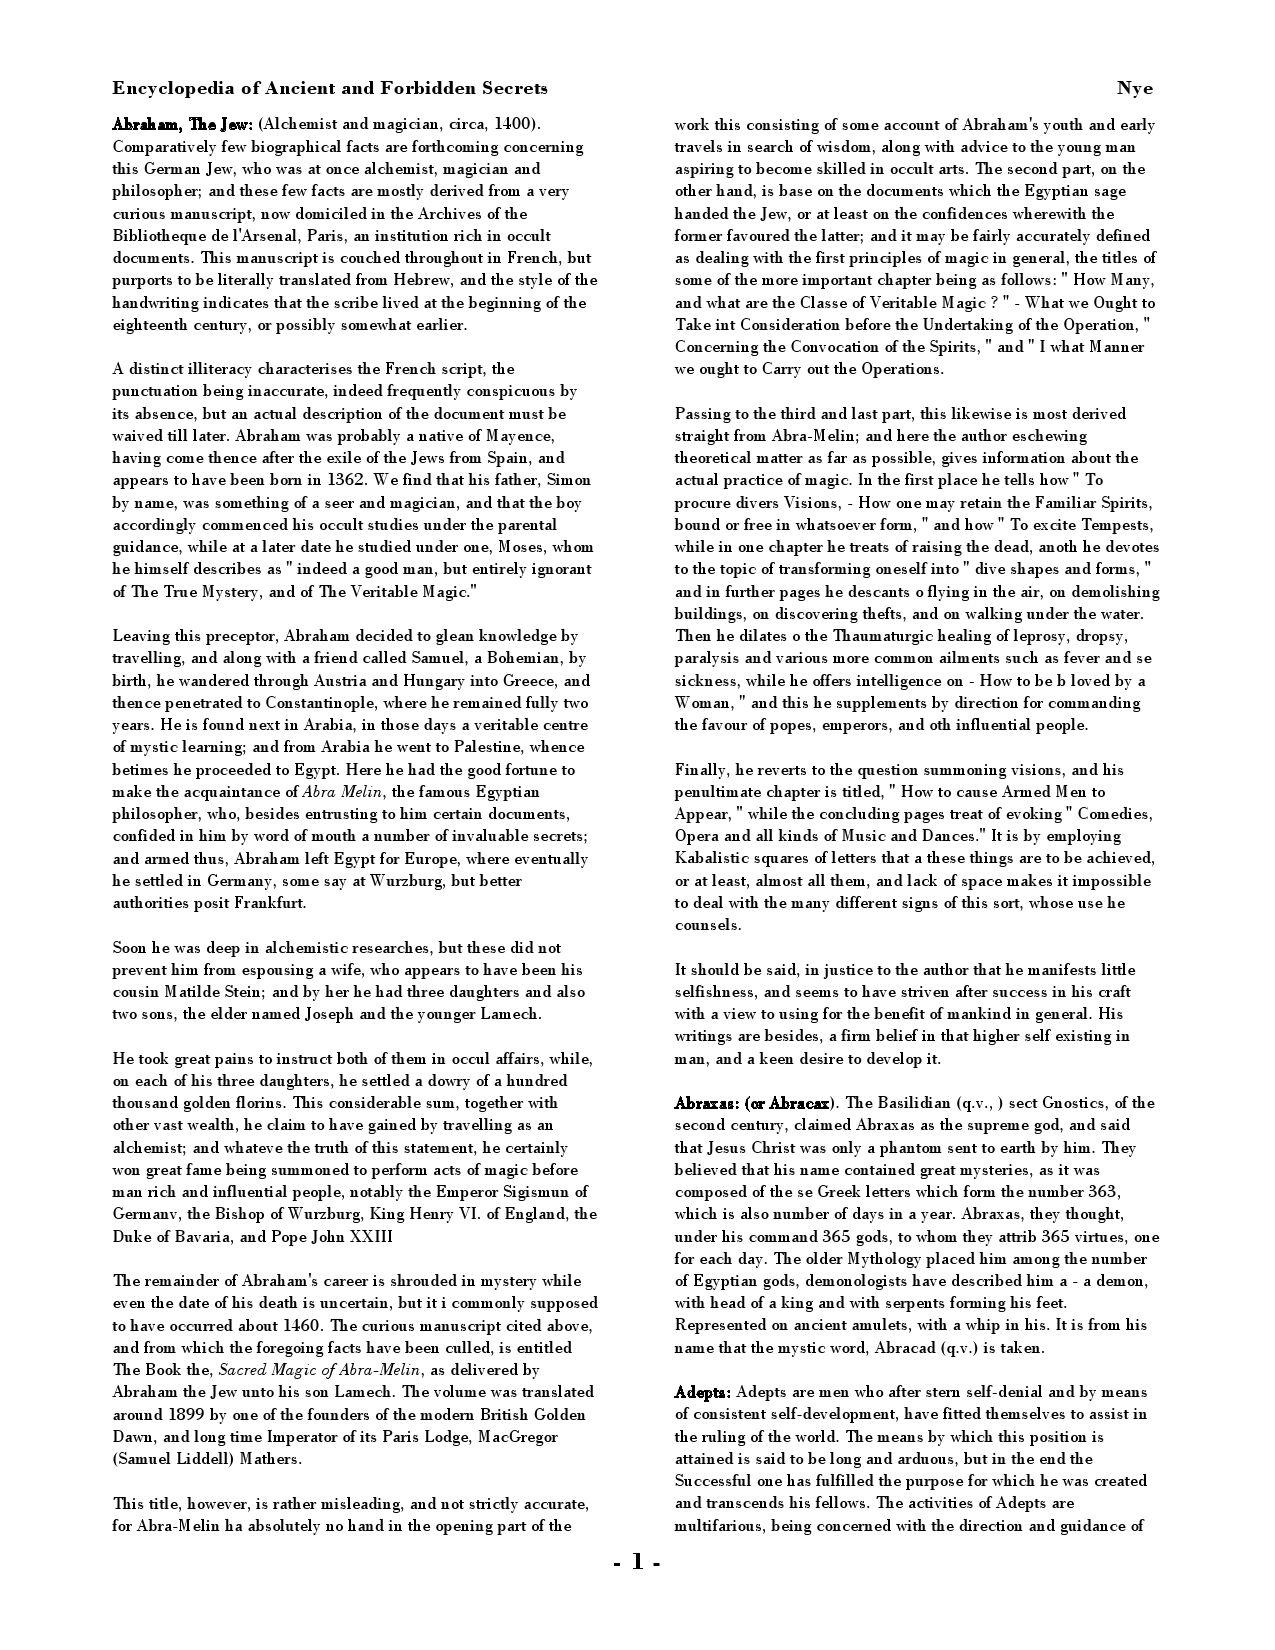 Encyclopedia of Ancient & Forbidden Secrets by Carl Farrell issuu